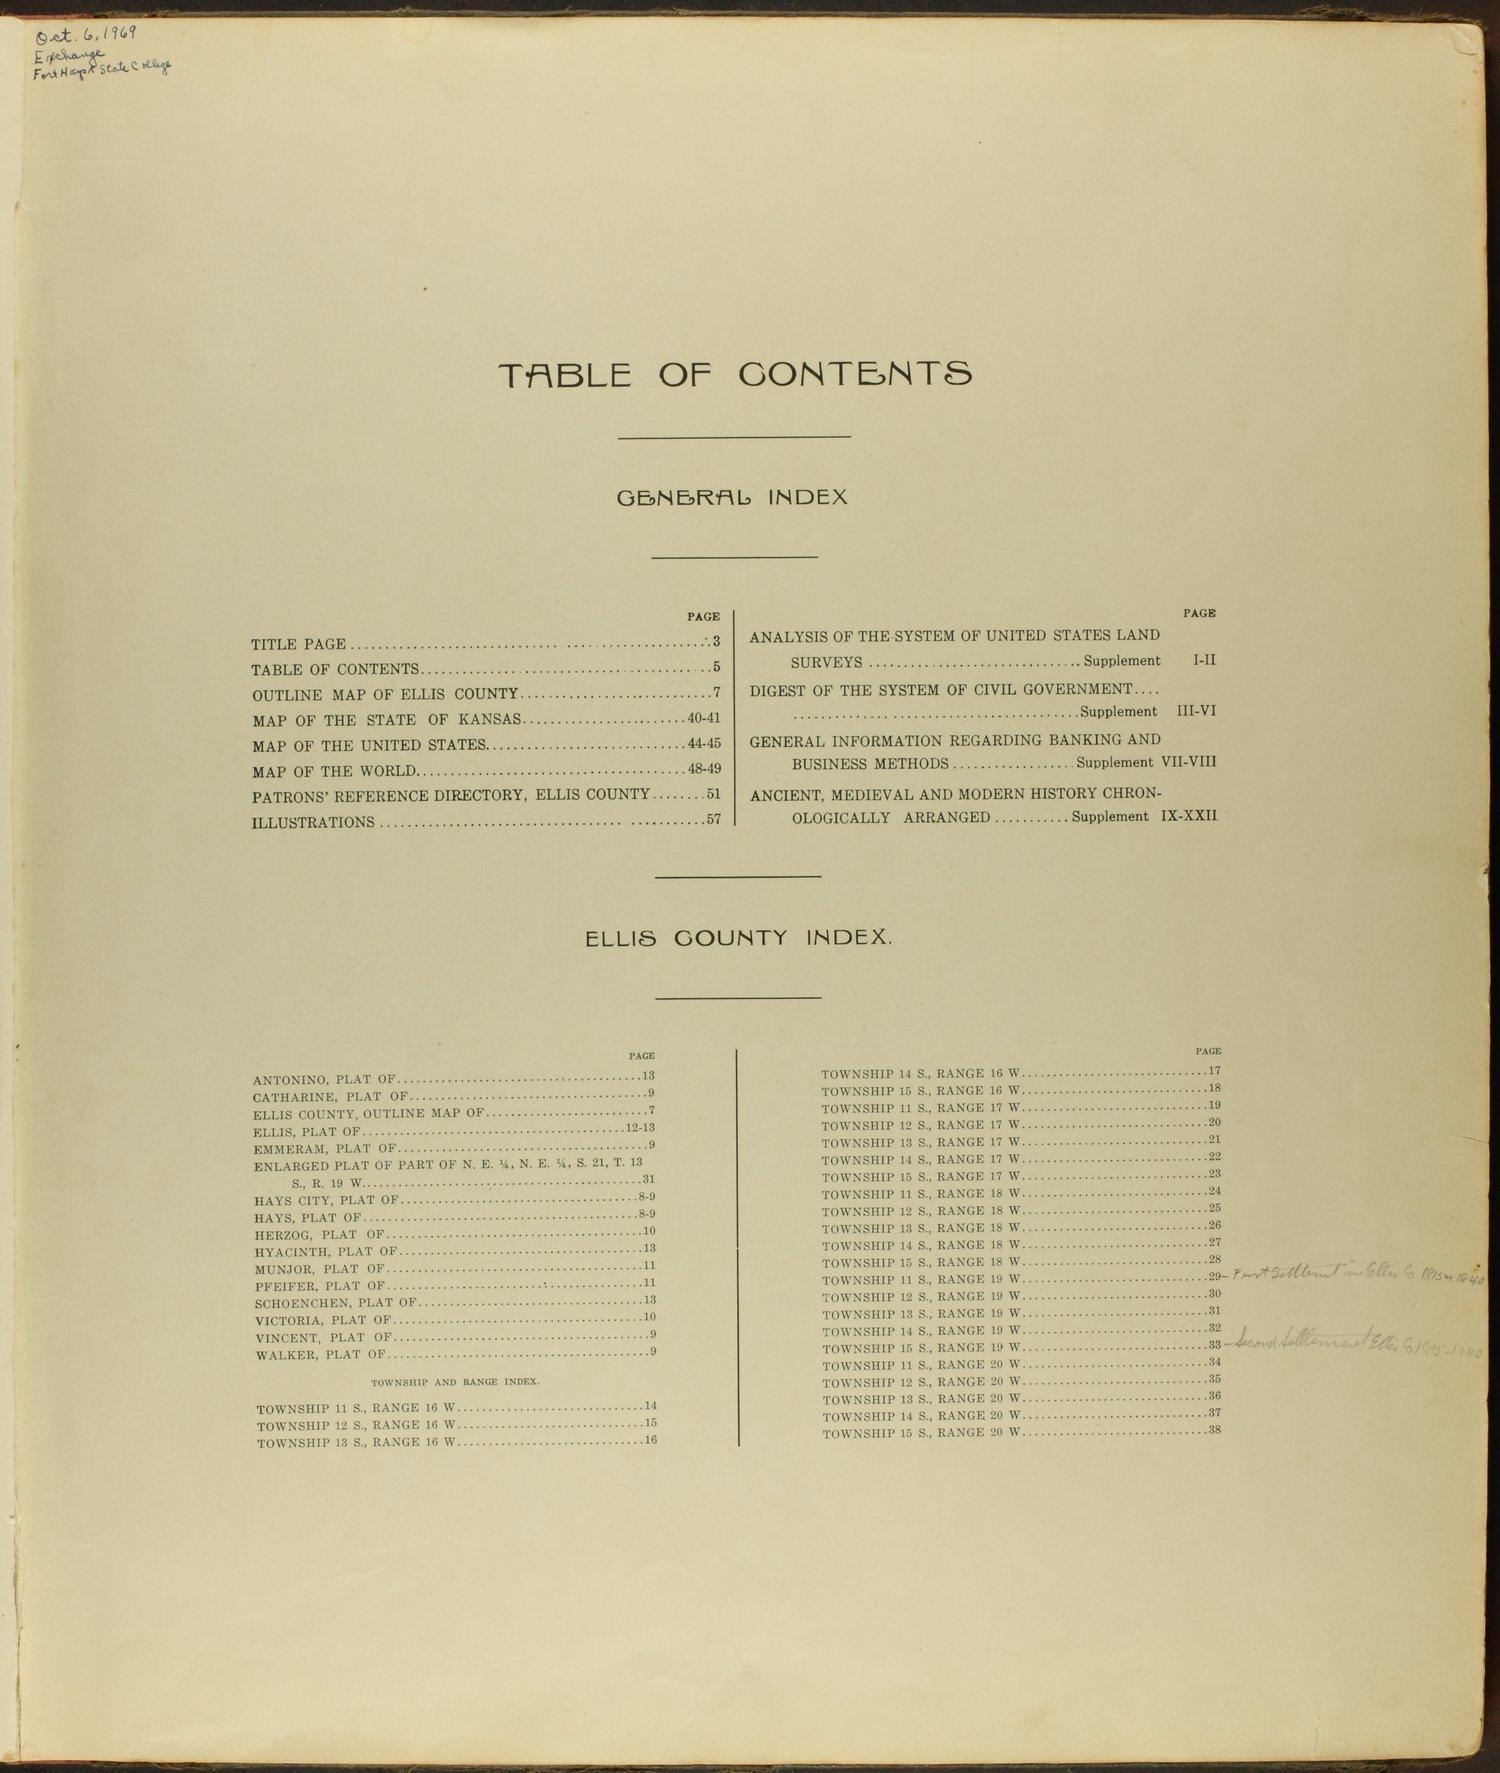 Standard atlas of Ellis County, Kansas - Table of Contents